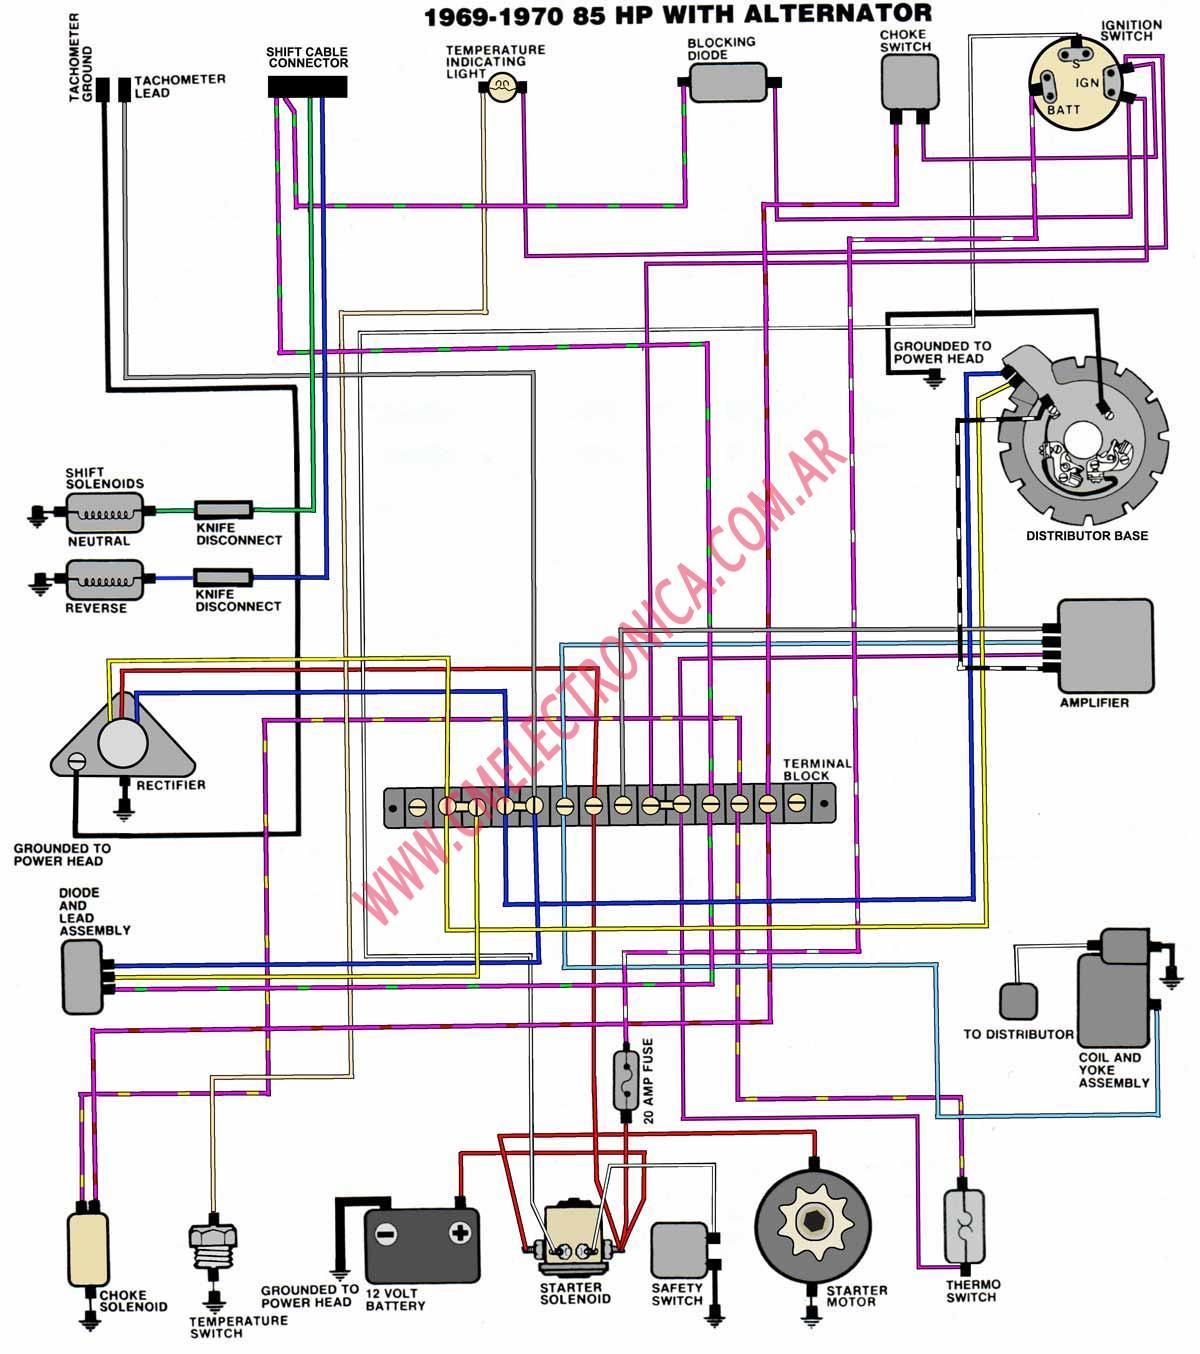 evinrude_johnson 69_70_v4?resize\\\\\\\=665%2C750 suzuki dt85 wiring diagram suzuki df140 wiring diagram, suzuki Suzuki DT40 Outboard Parts Diagrams at mifinder.co